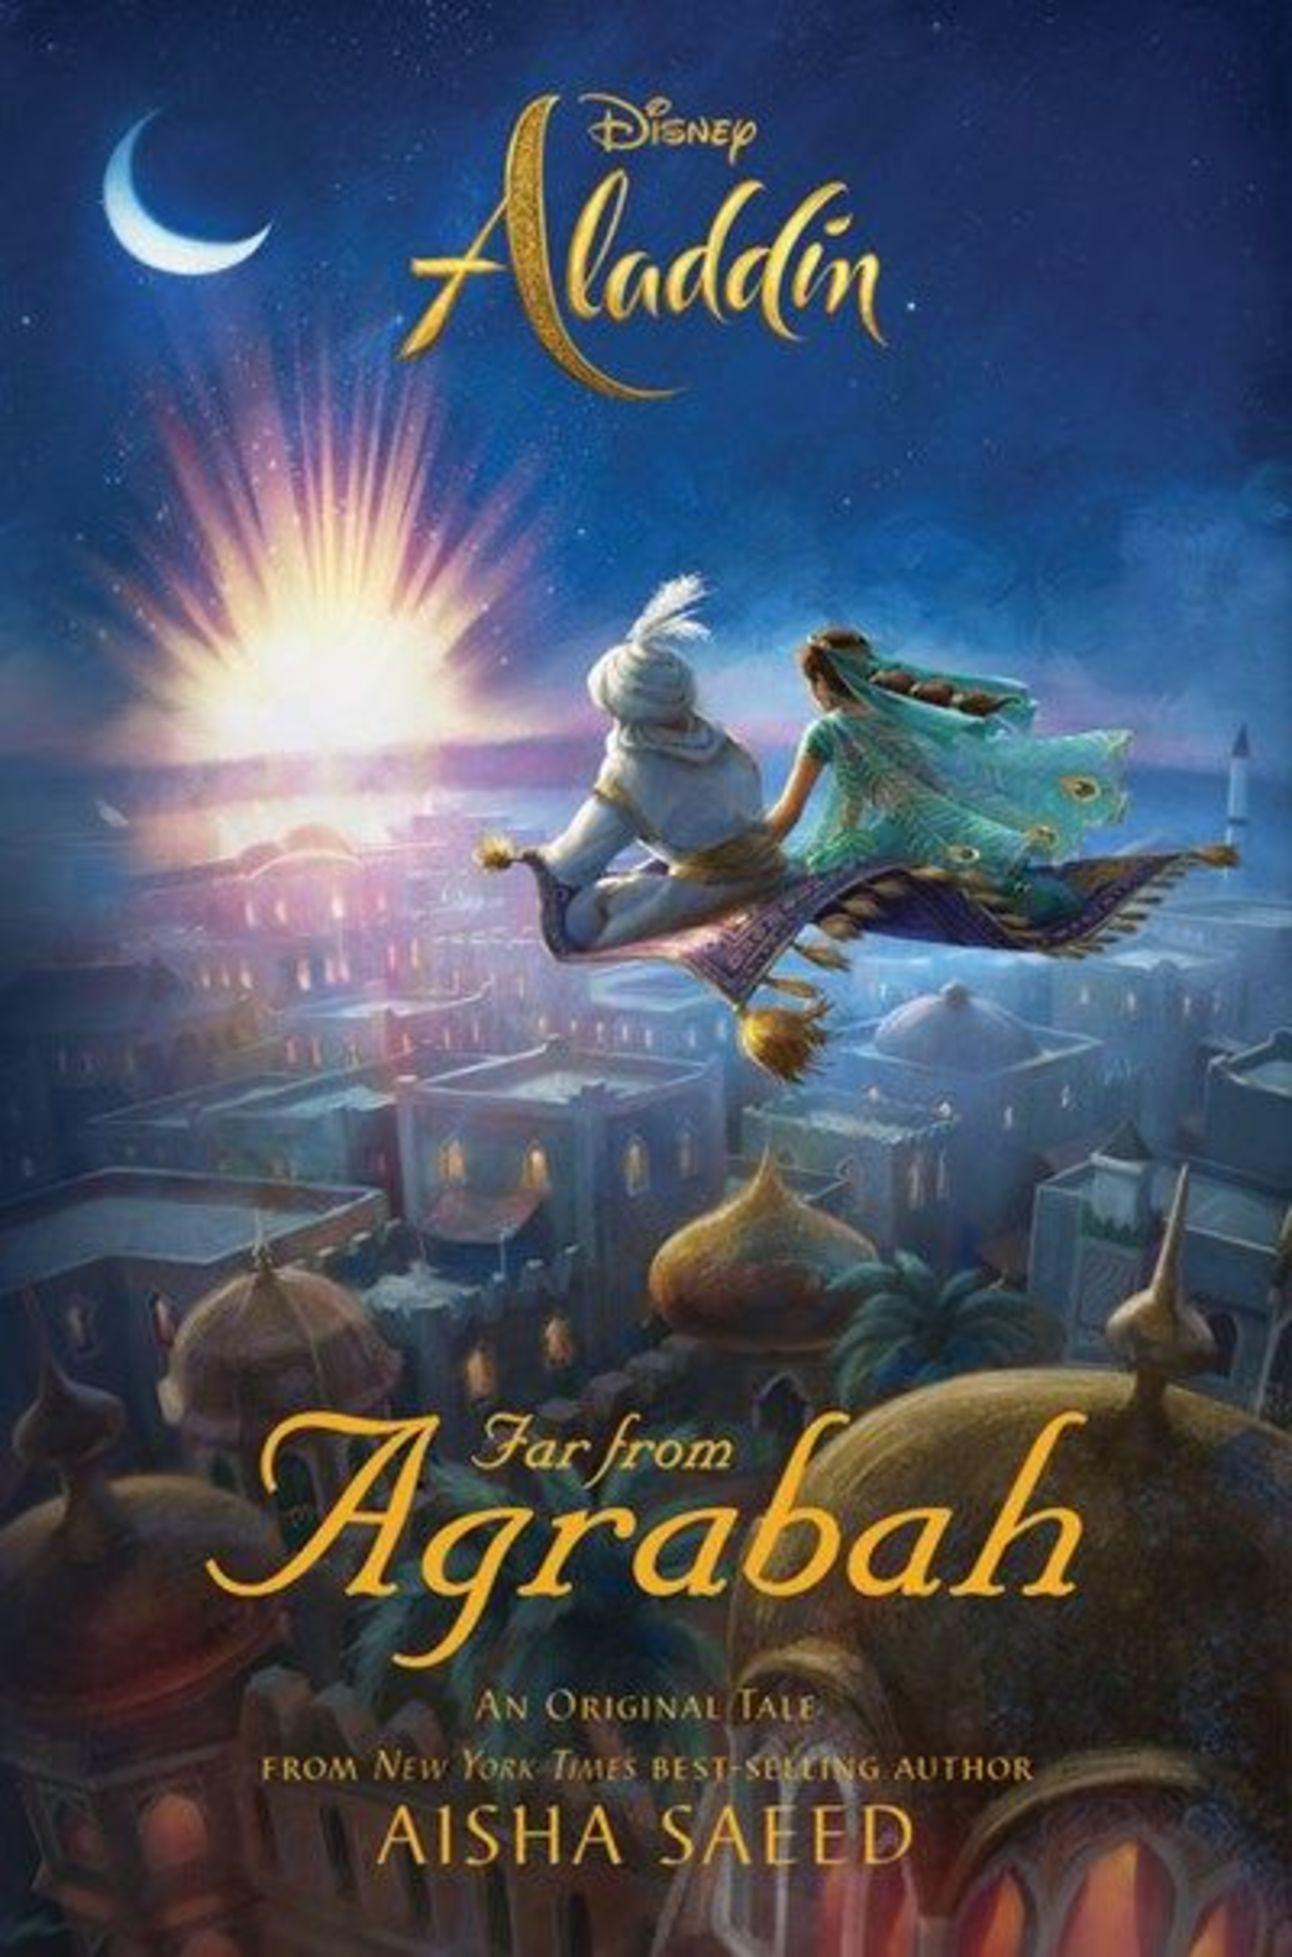 aladdin-far-from-agrabah